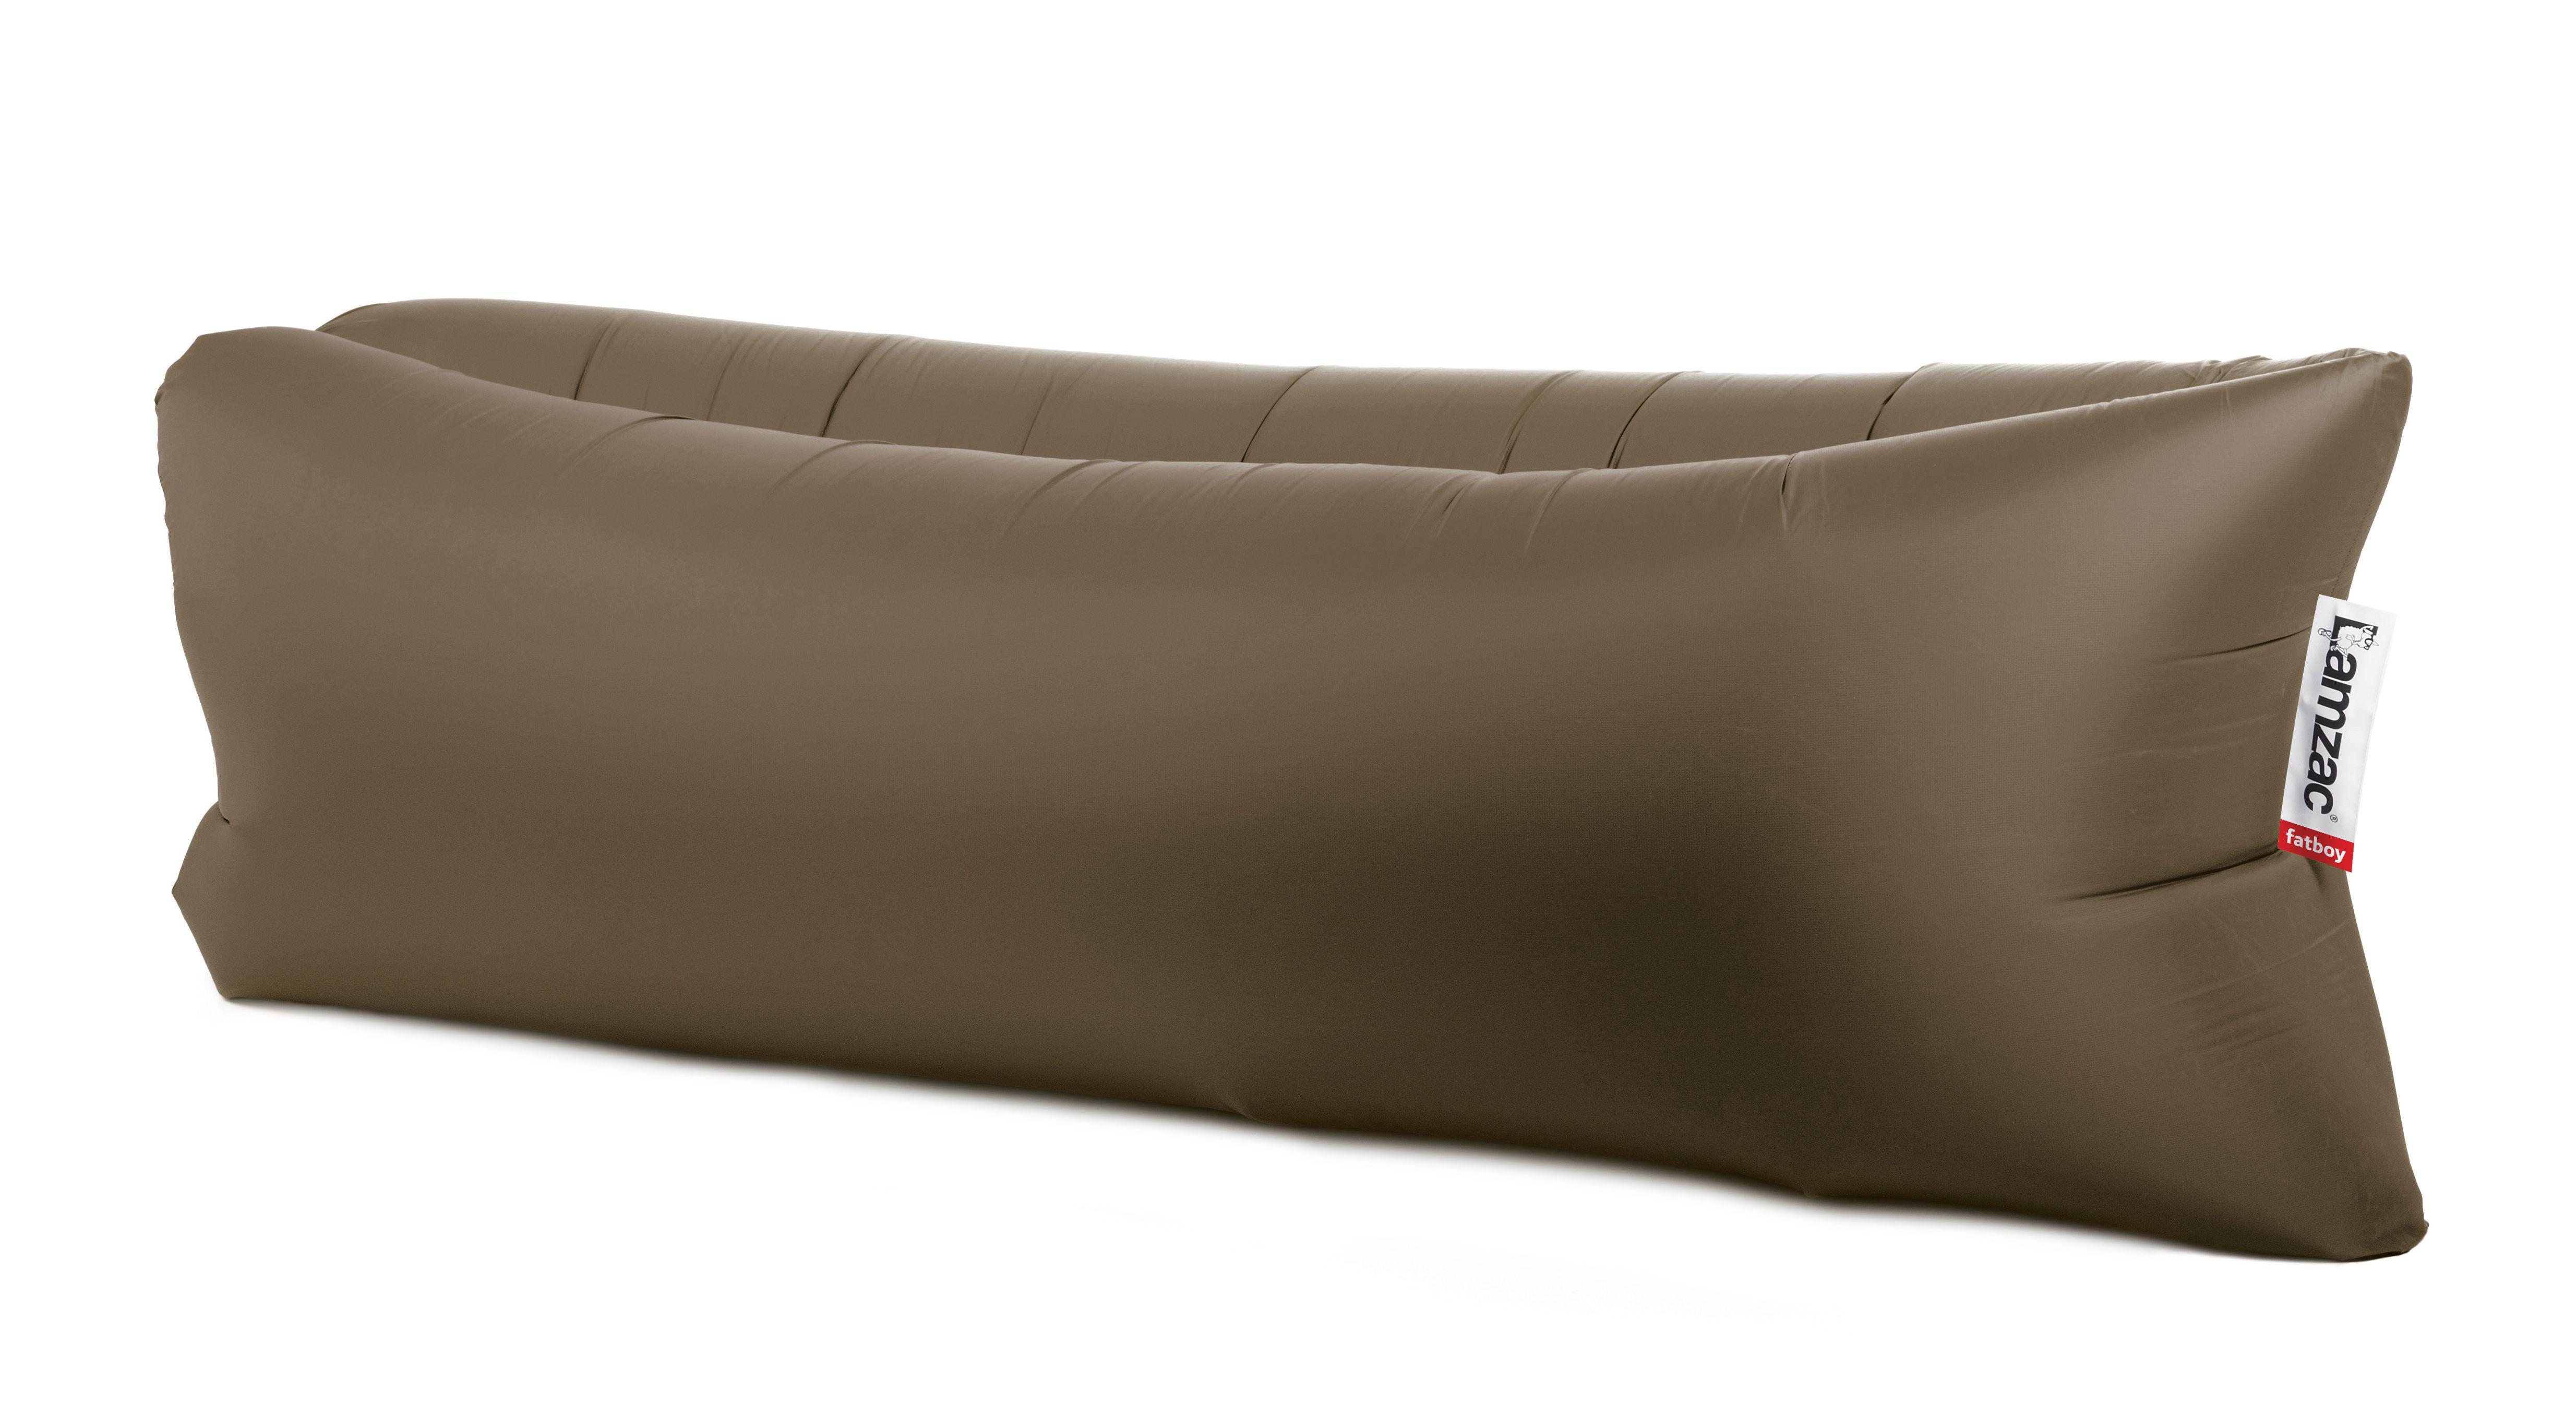 pouf lamzac the original gonflable l 200 cm vert olive fatboy. Black Bedroom Furniture Sets. Home Design Ideas